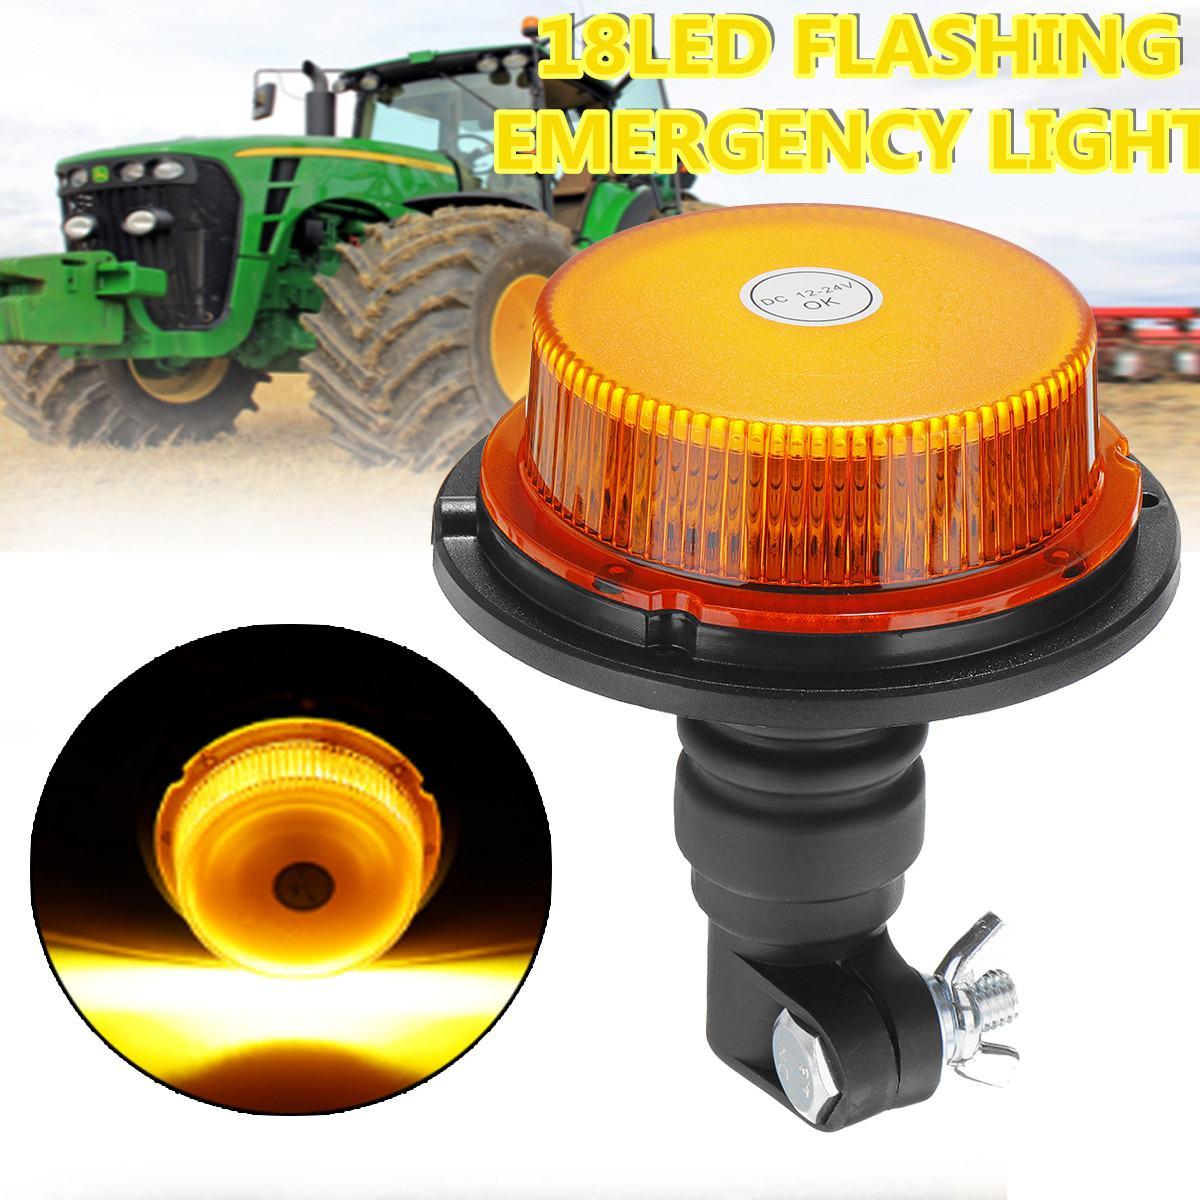 "5.2x4.7"" Inch Dome 18 LED Construction Vehicle Car Warning Strobe Light Flashing Lights Truck Emergency Light 12-24V Waterproof"